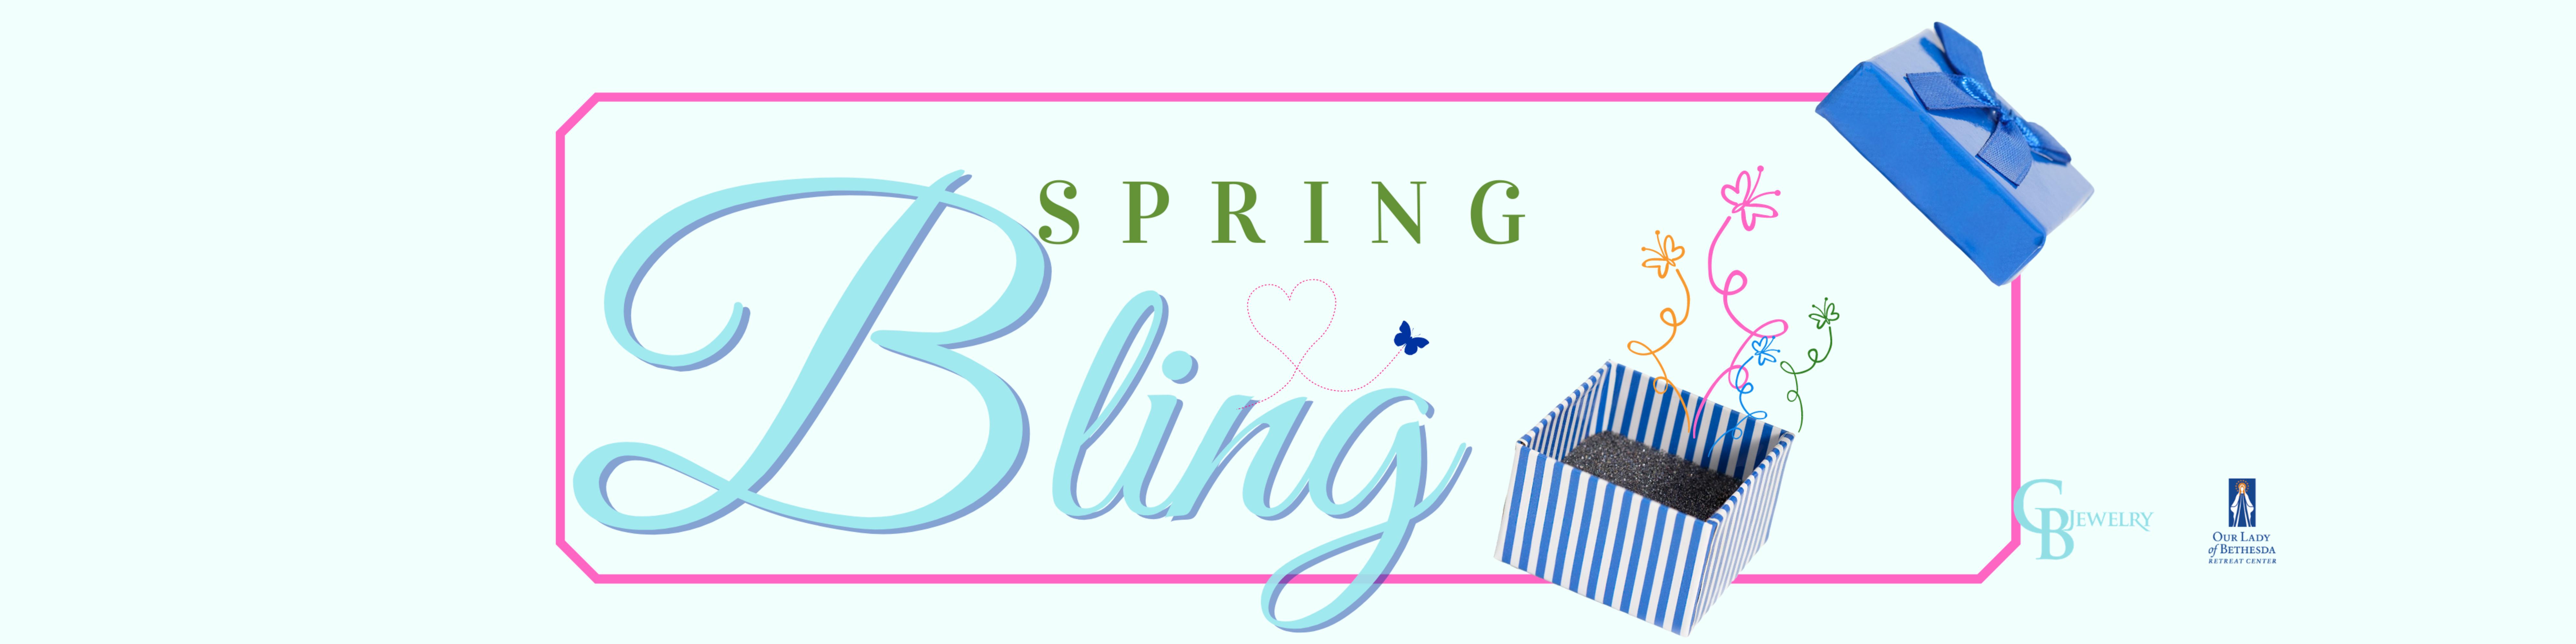 Olb Spring Bling 2021 Header